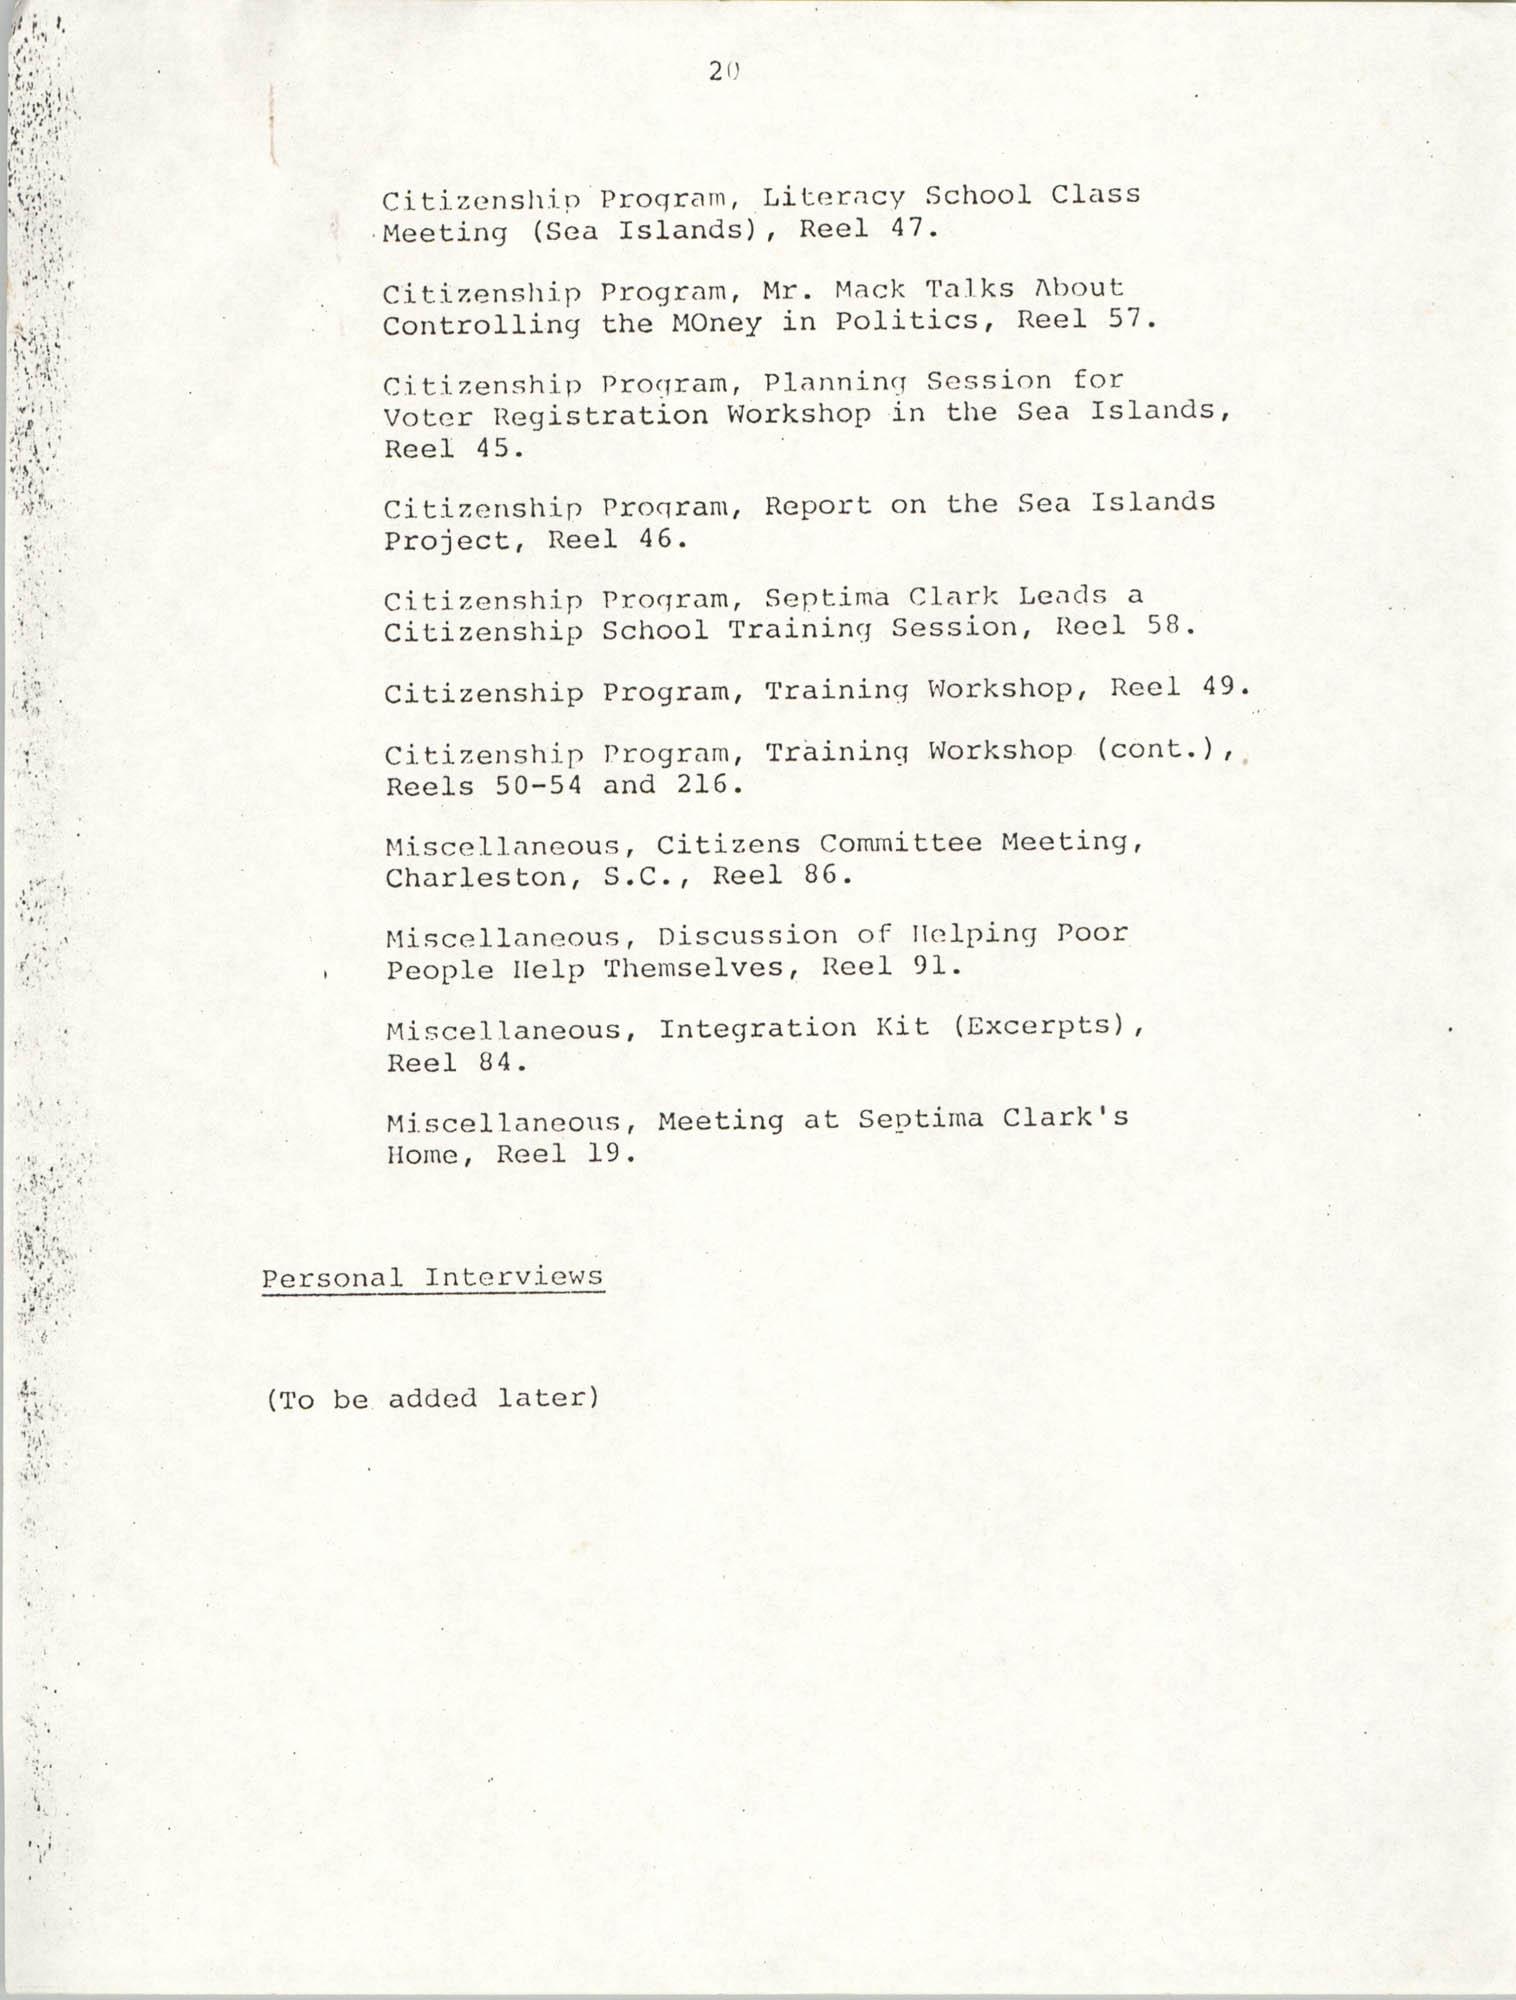 Dissertation Proposal, Page 20